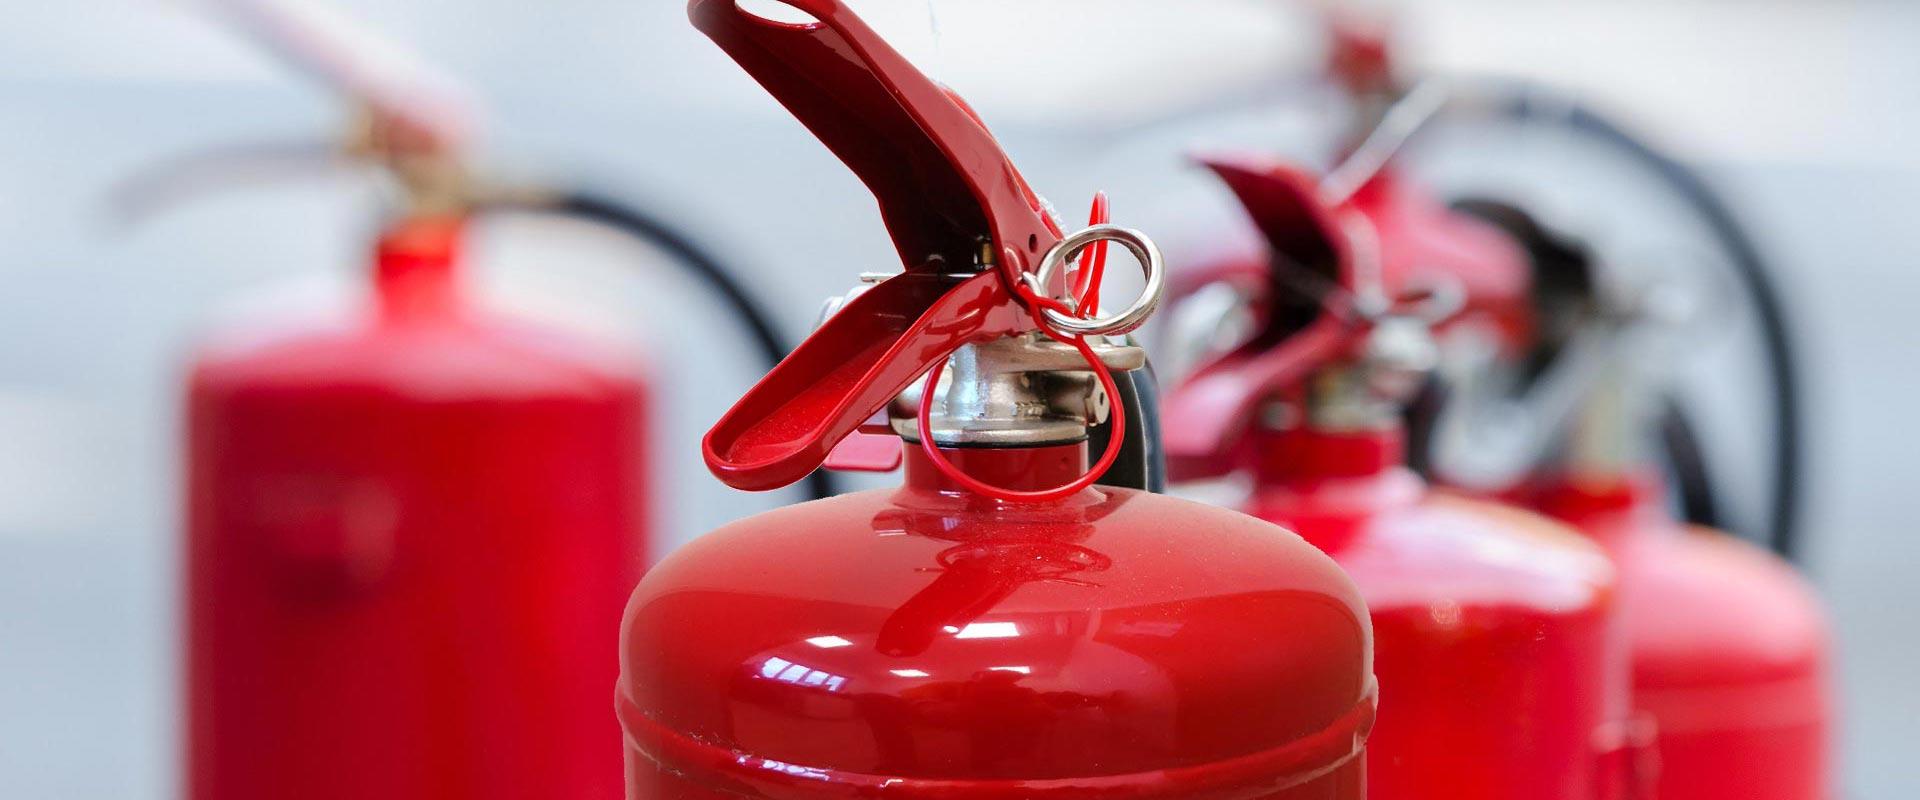 https://www.emme-italia.com/sites/default/files/revslider/image/emme-antincendio-srl-produzione-estintori-omologati--3_0_.jpg